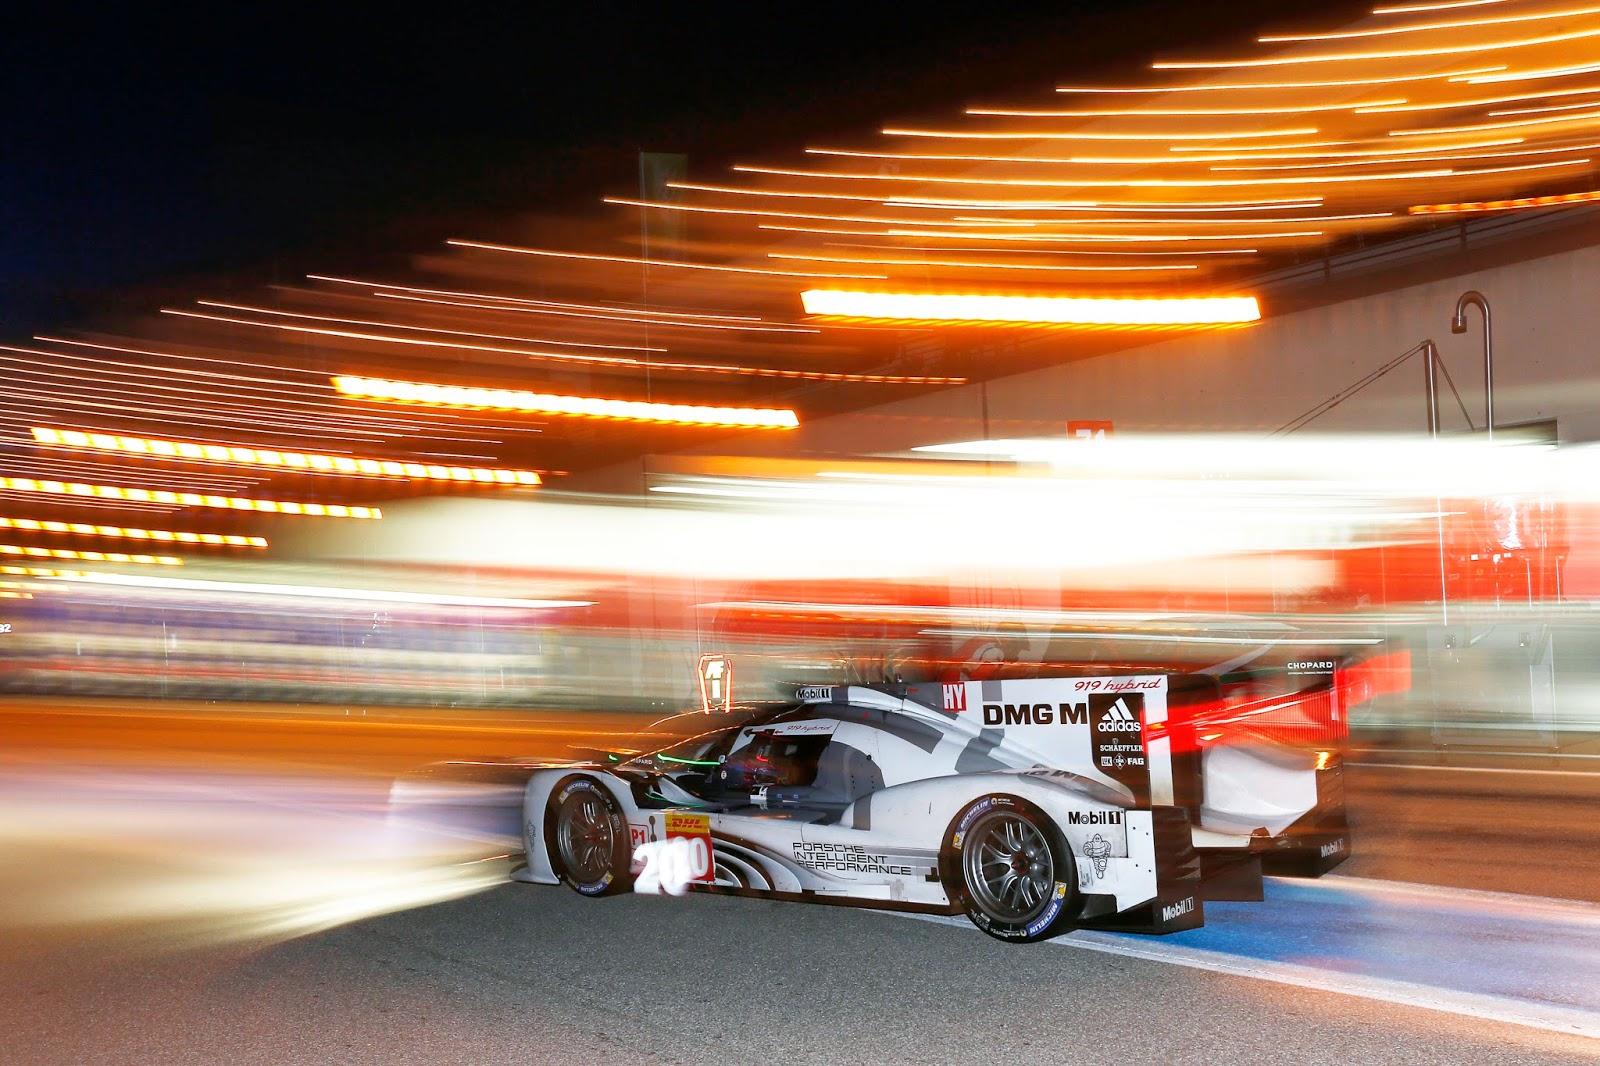 Porsche 919 Hybrid Testing At Paul Ricard